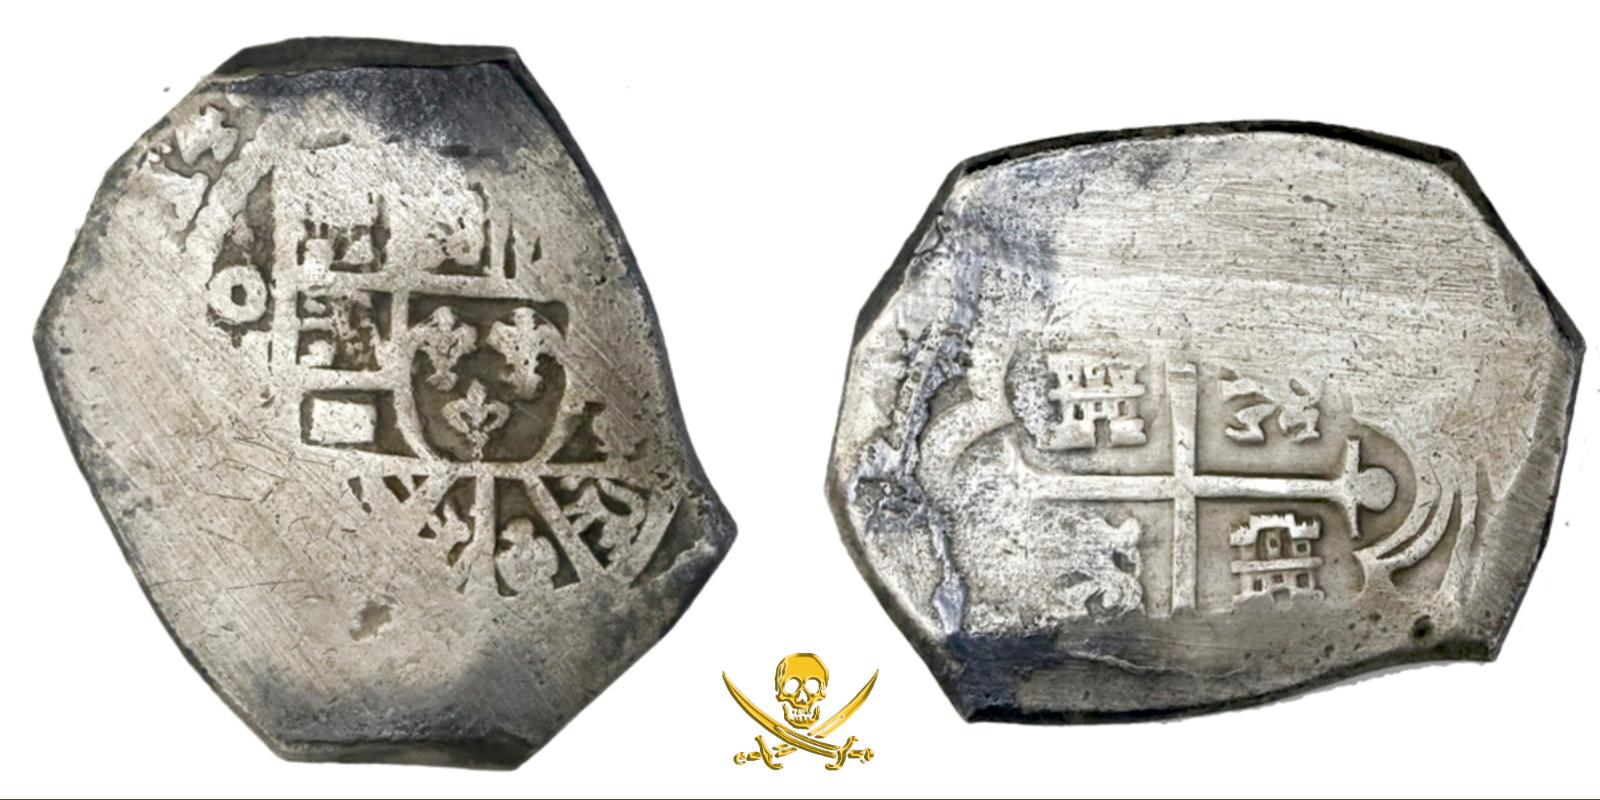 "MEXICO 8 REALES 1714 ""1715 FLEET SHIPWRECK"" PIRATE GOLD COINS TREASURE W/ CERT"